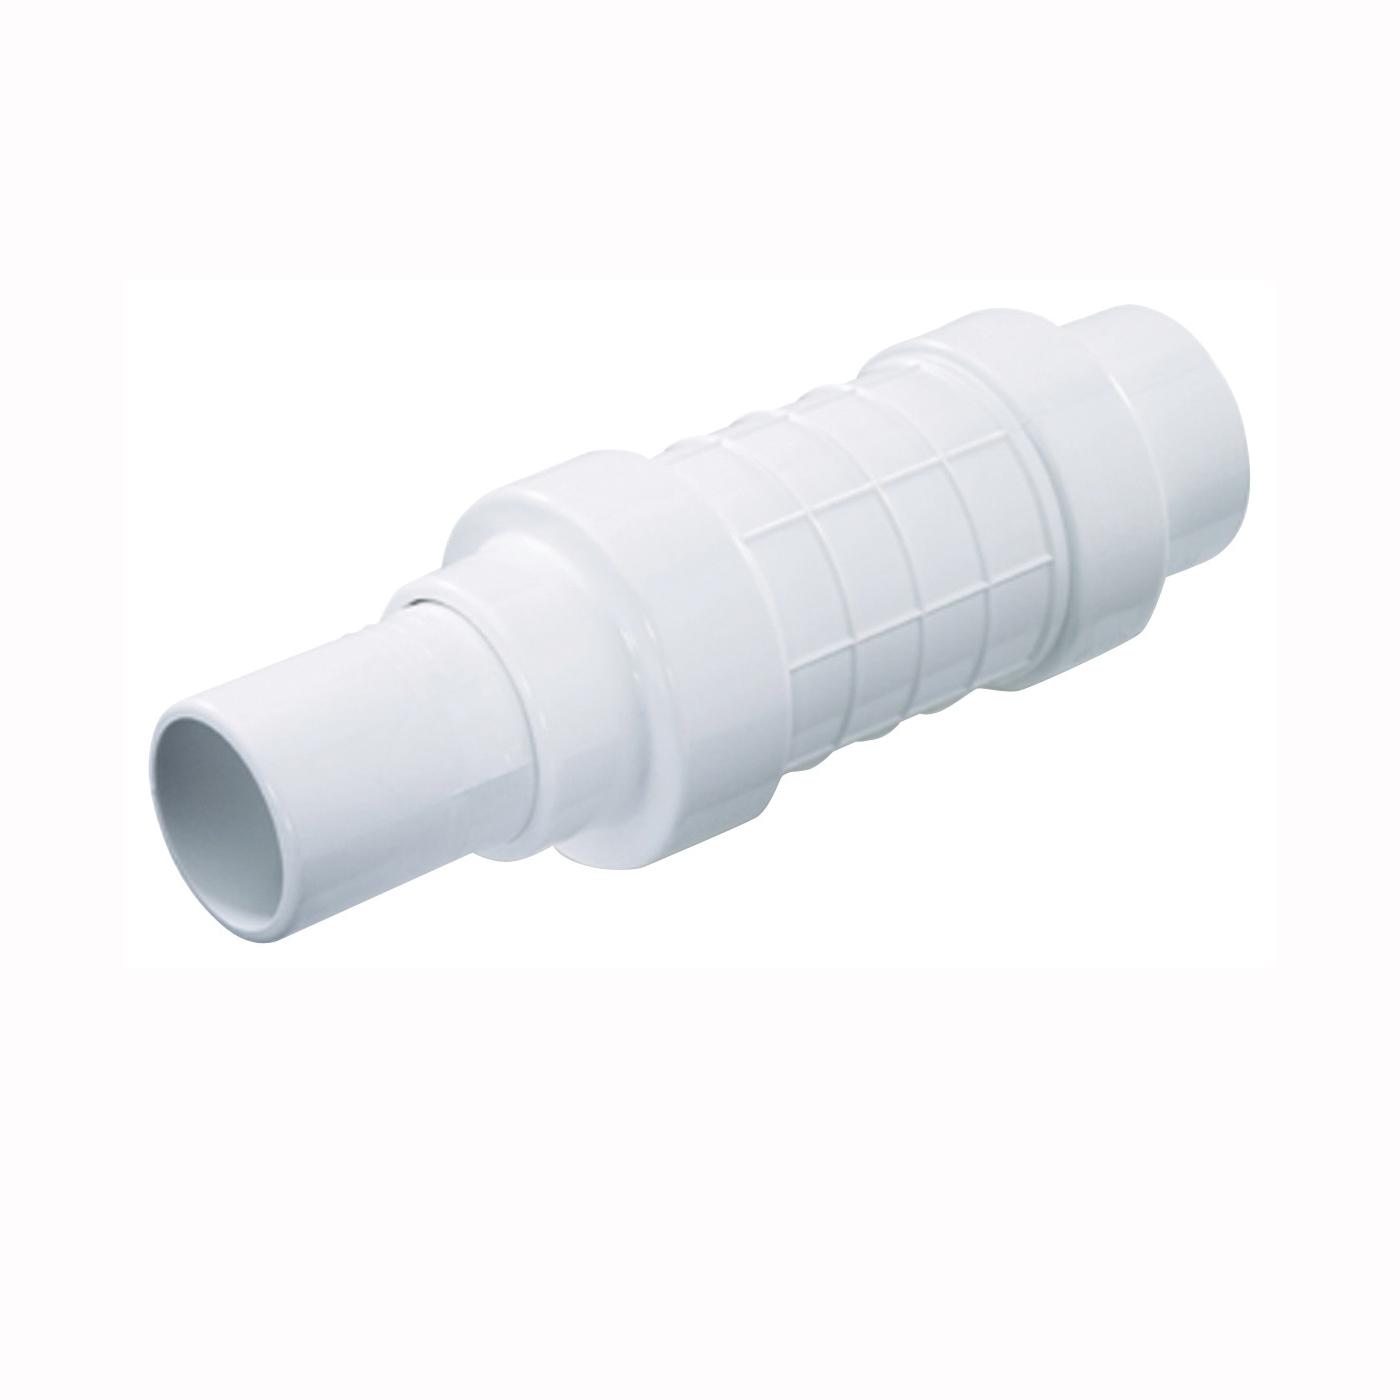 Picture of NDS Quik-Fix QF-0750 Pipe Repair Coupler, 3/4 in, Socket x Spigot, White, SCH 40 Schedule, 150 psi Pressure